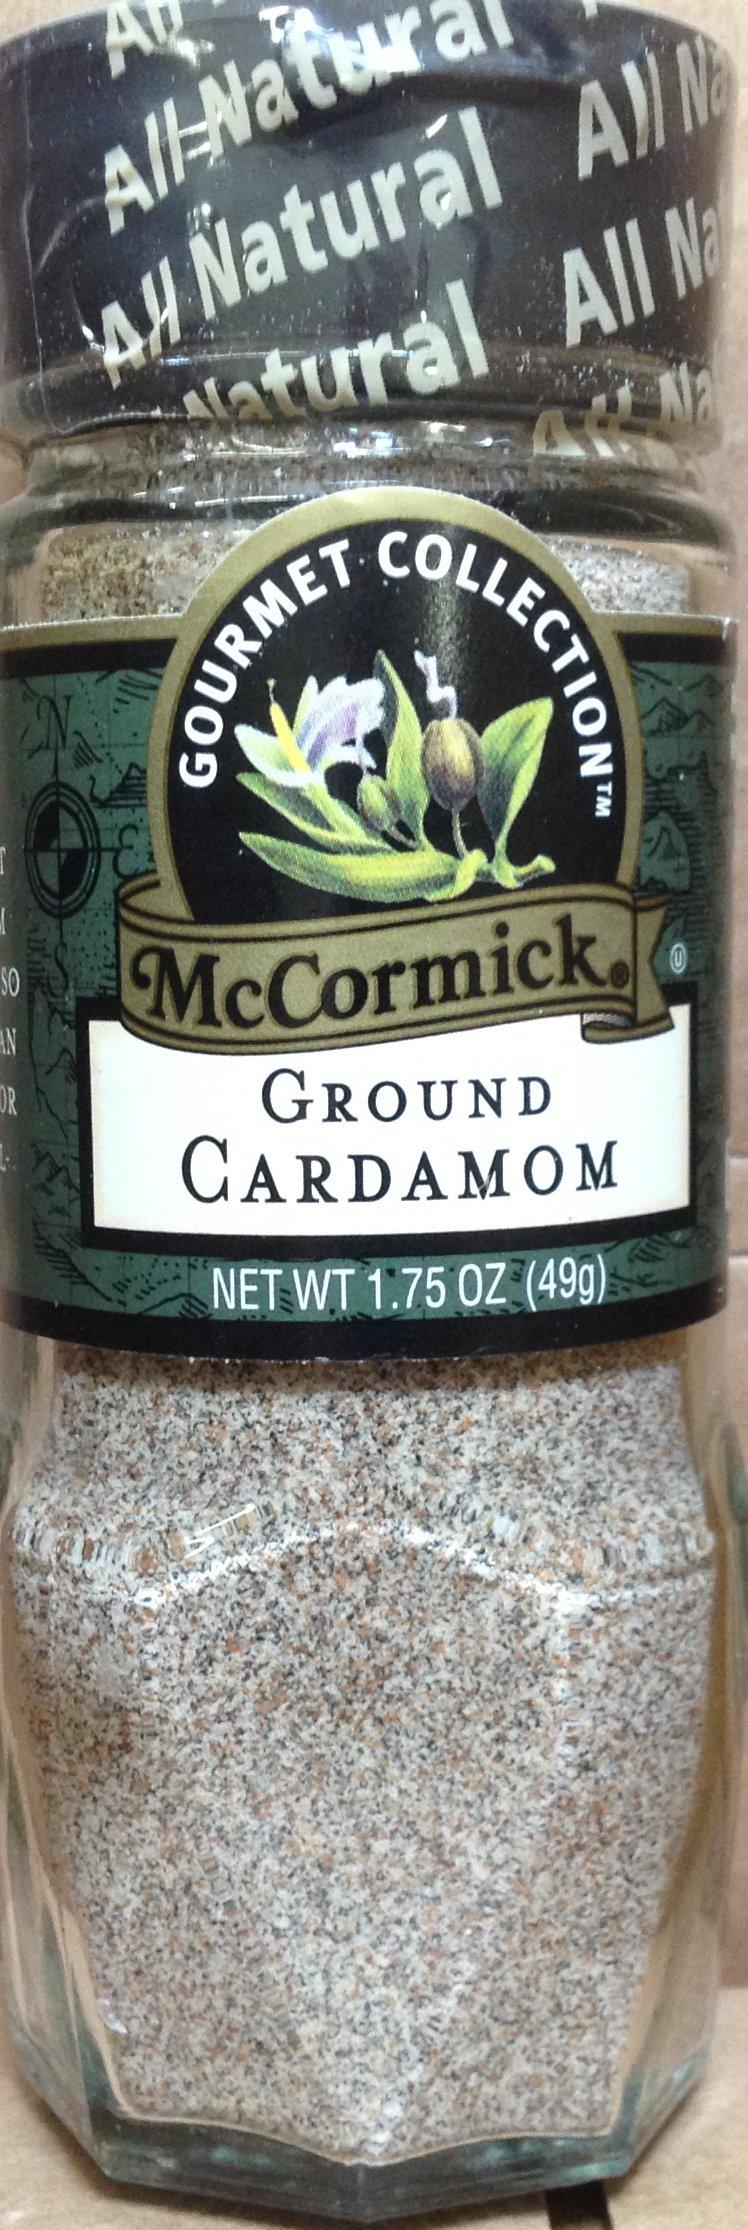 McCormick Gourmet GROUND CARDAMOM 1.75oz (2 Pack)